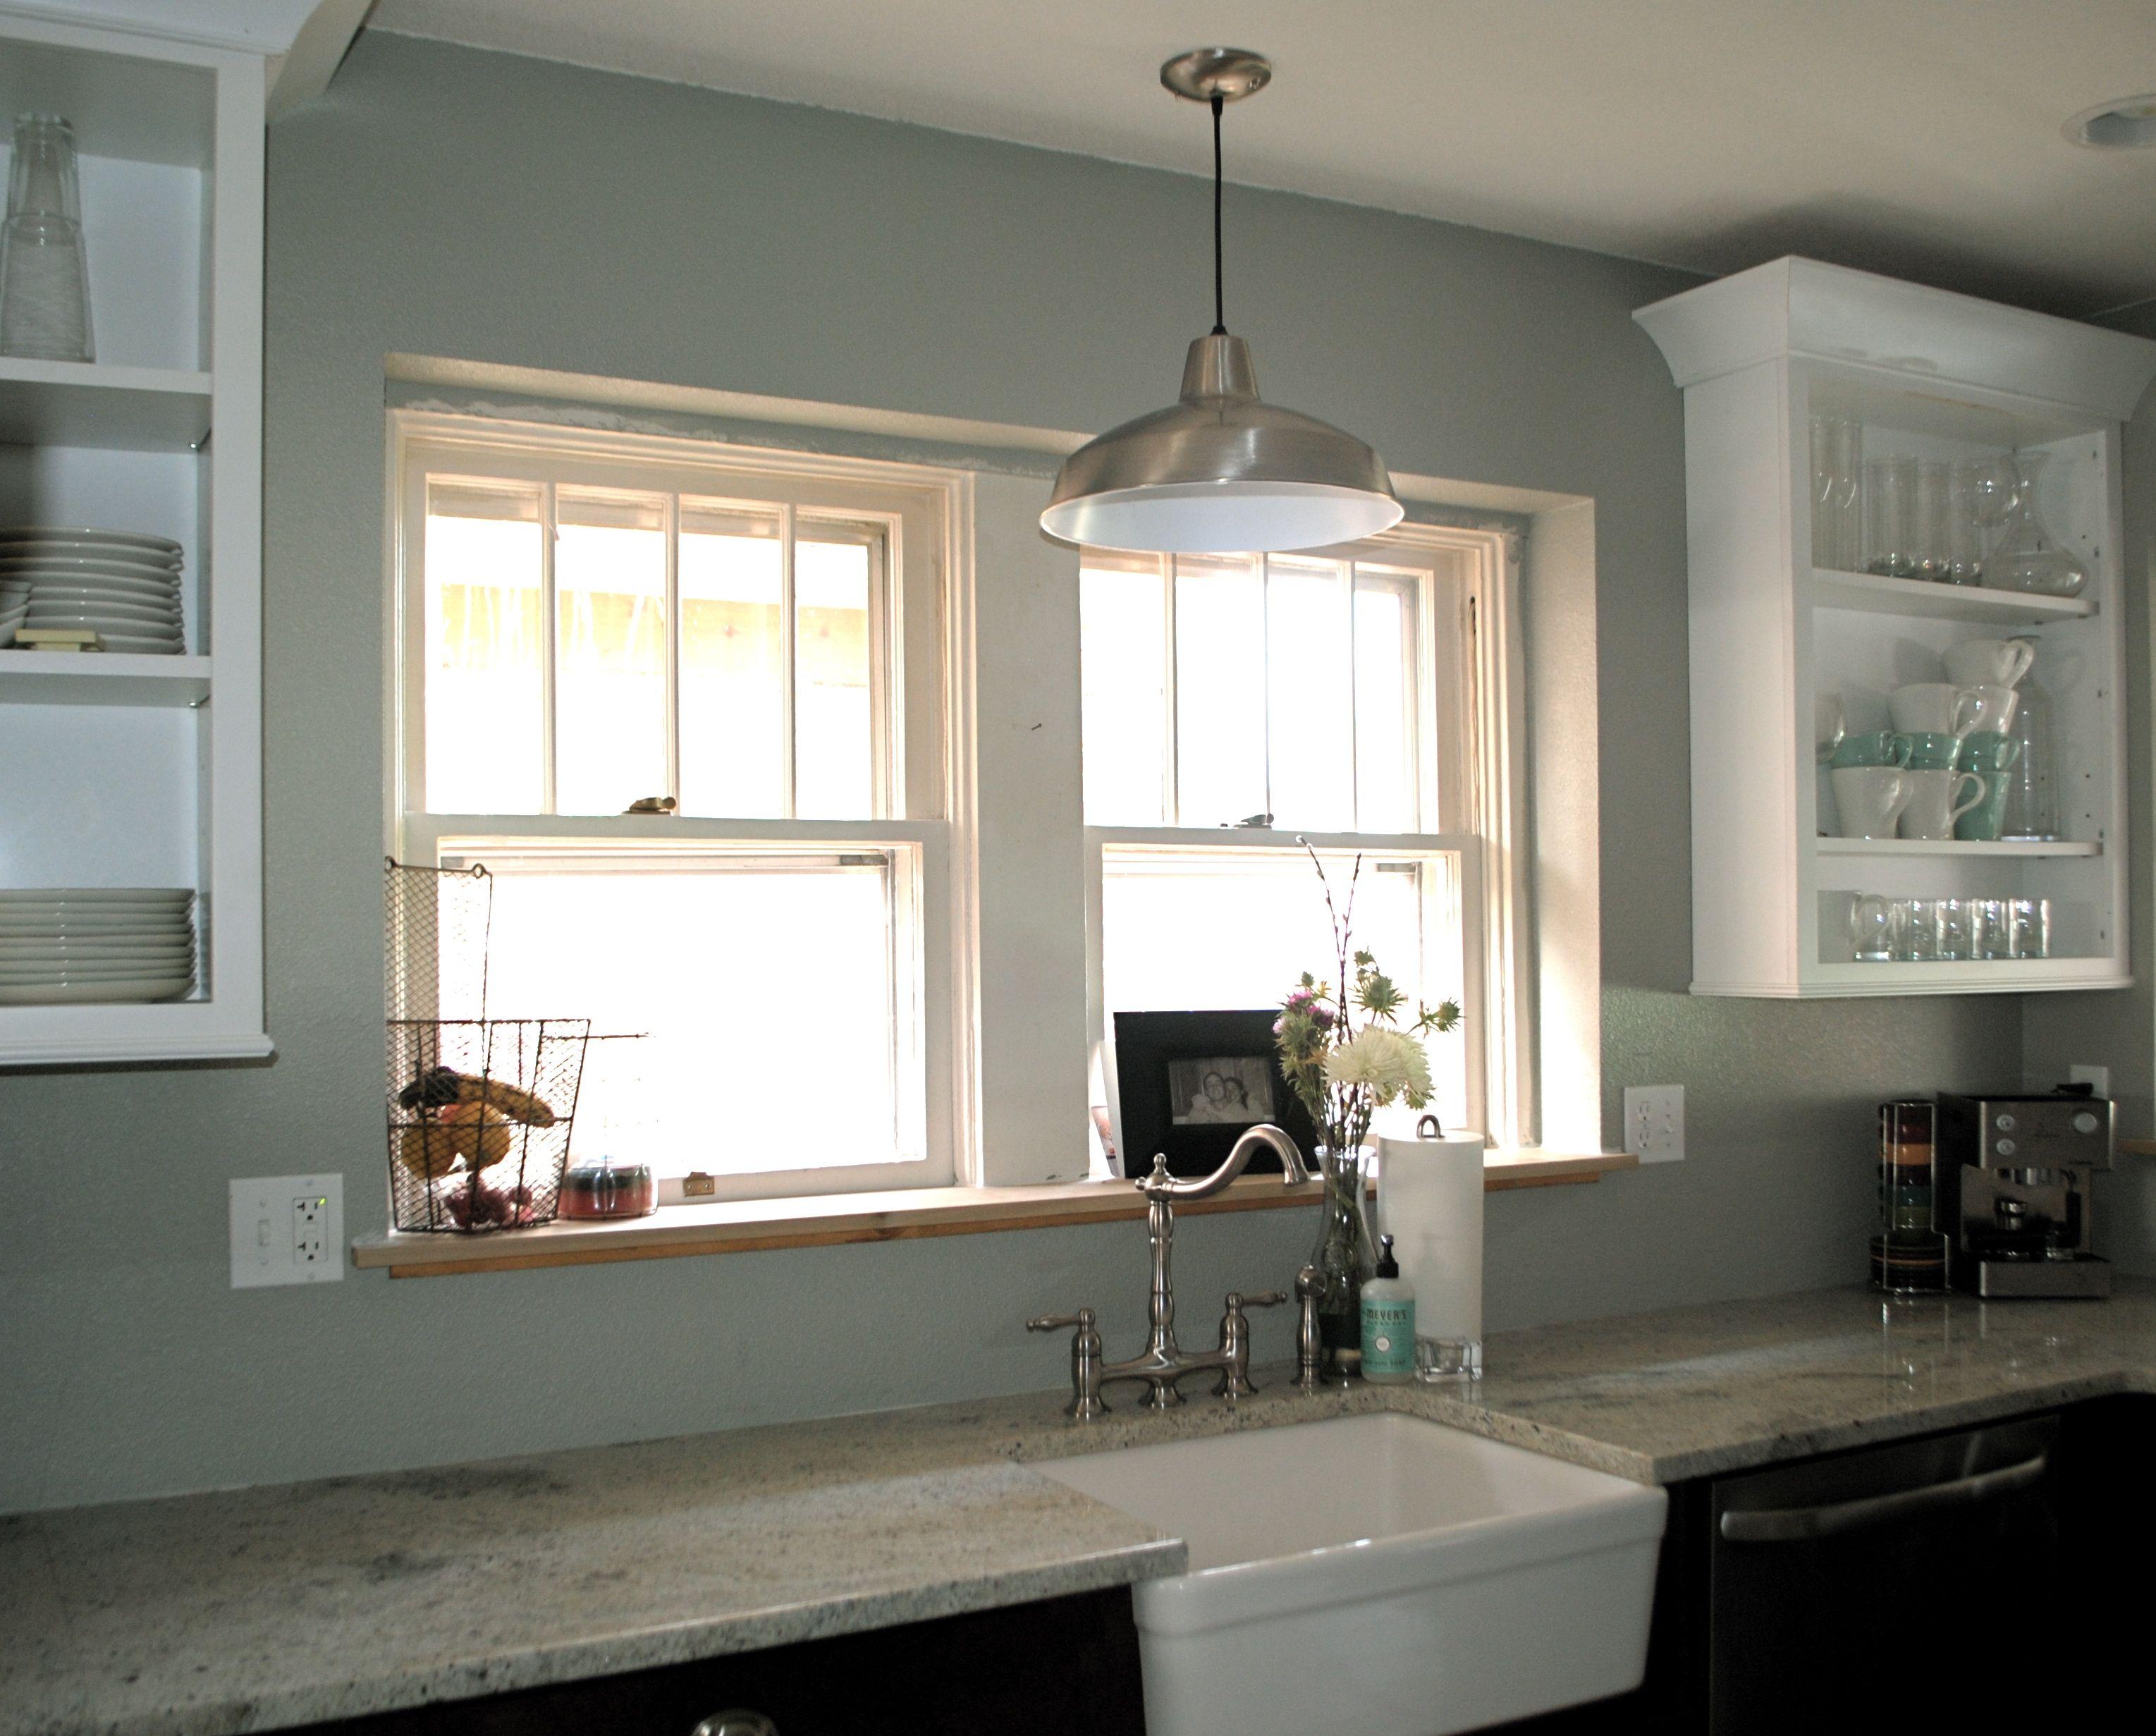 Kitchen Pendant Light Over Sink